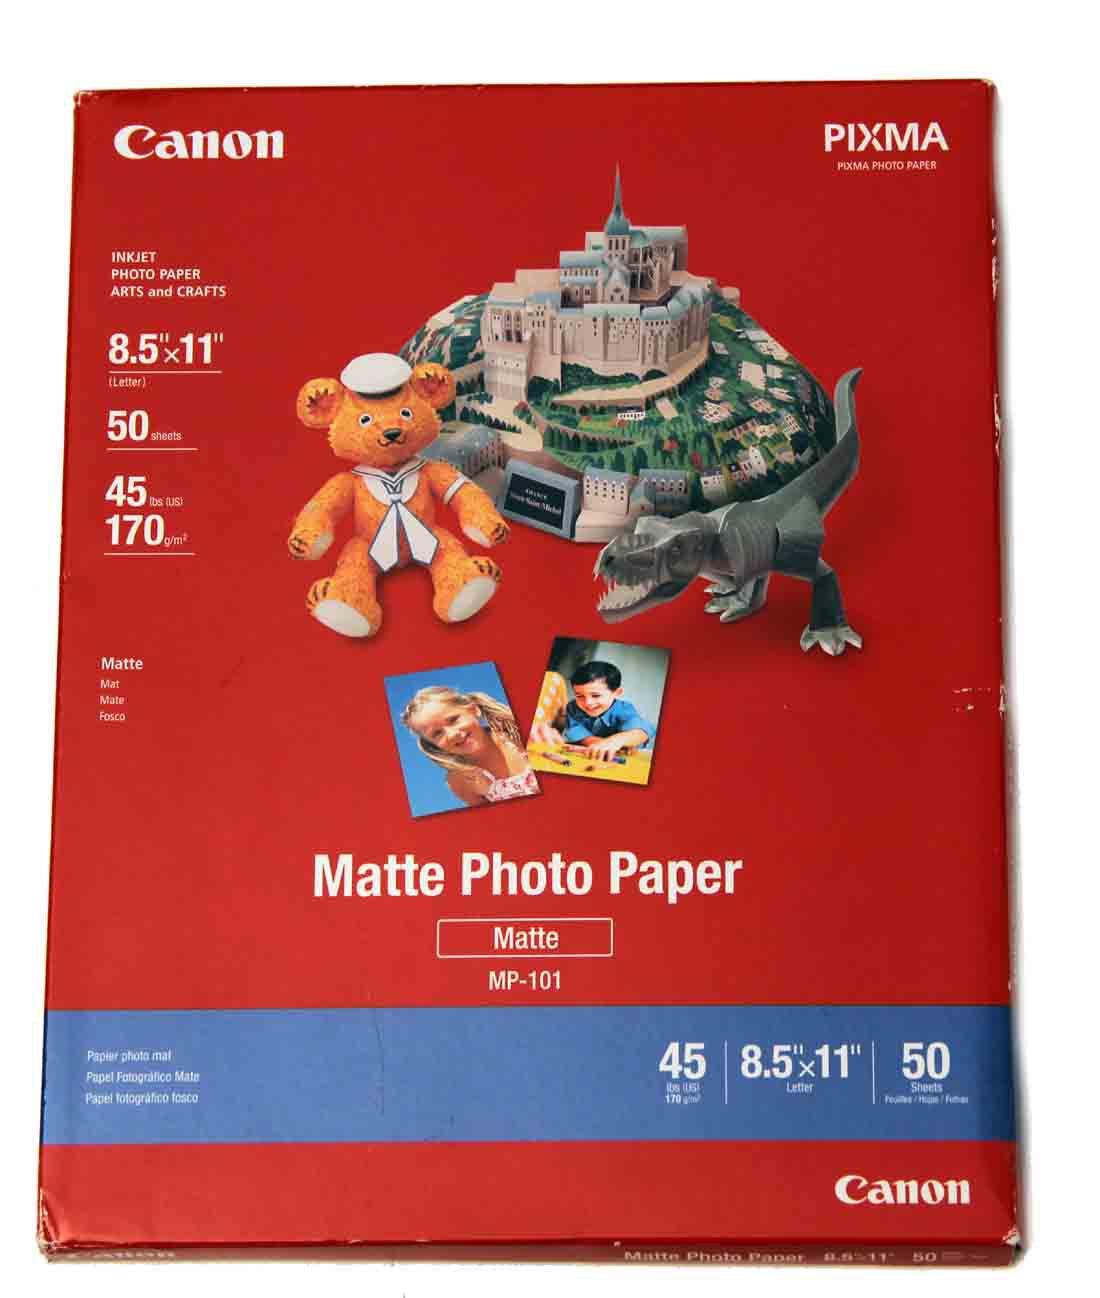 "Canon PIXMA InkJet Photo Paper 8.5"" X 11 Matte 50 Sheets MP-101"